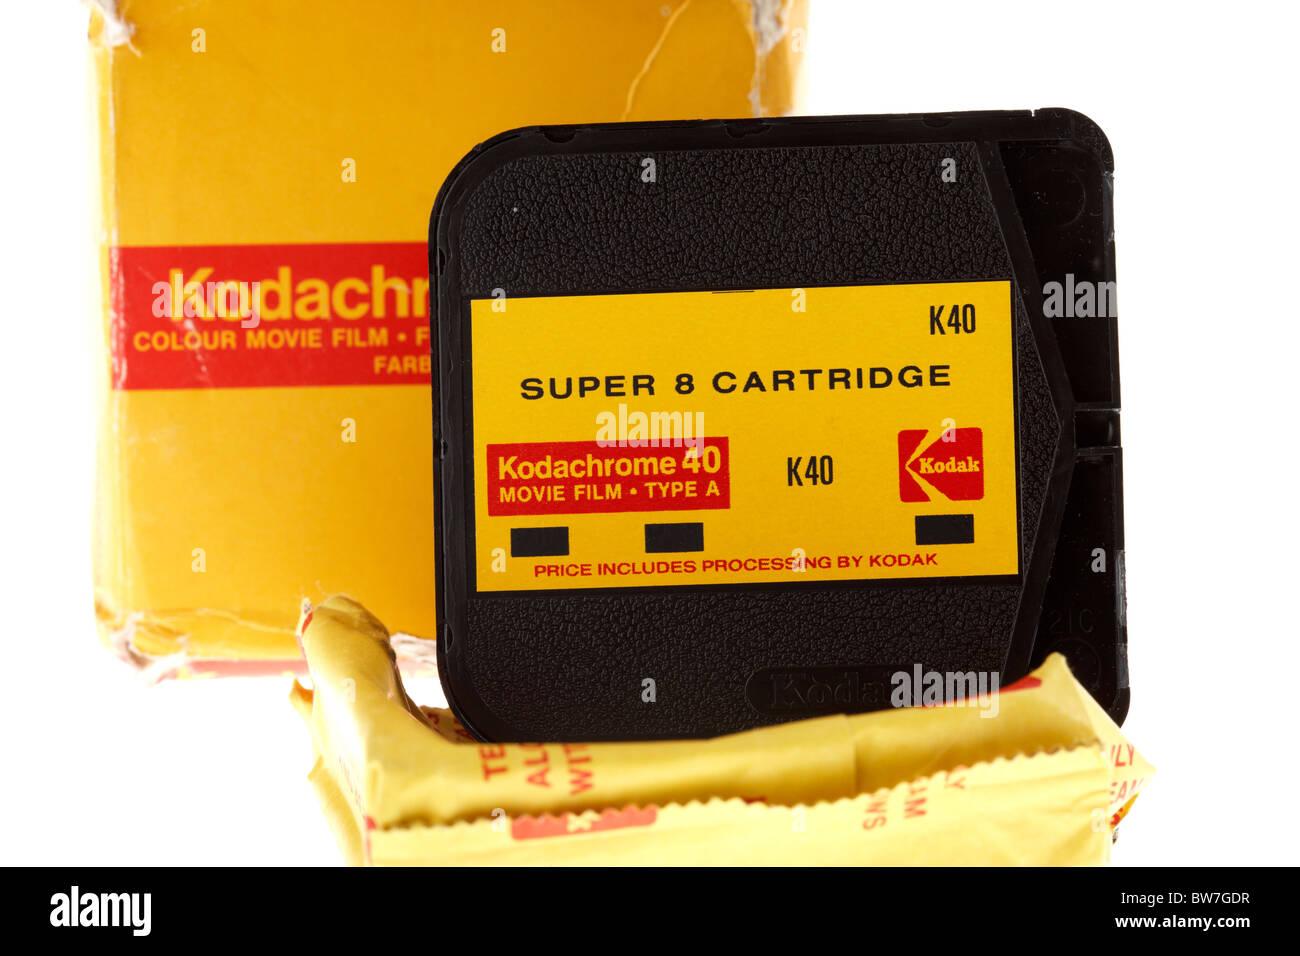 kodak kodachrome super8 cine movie film cartridge Stock